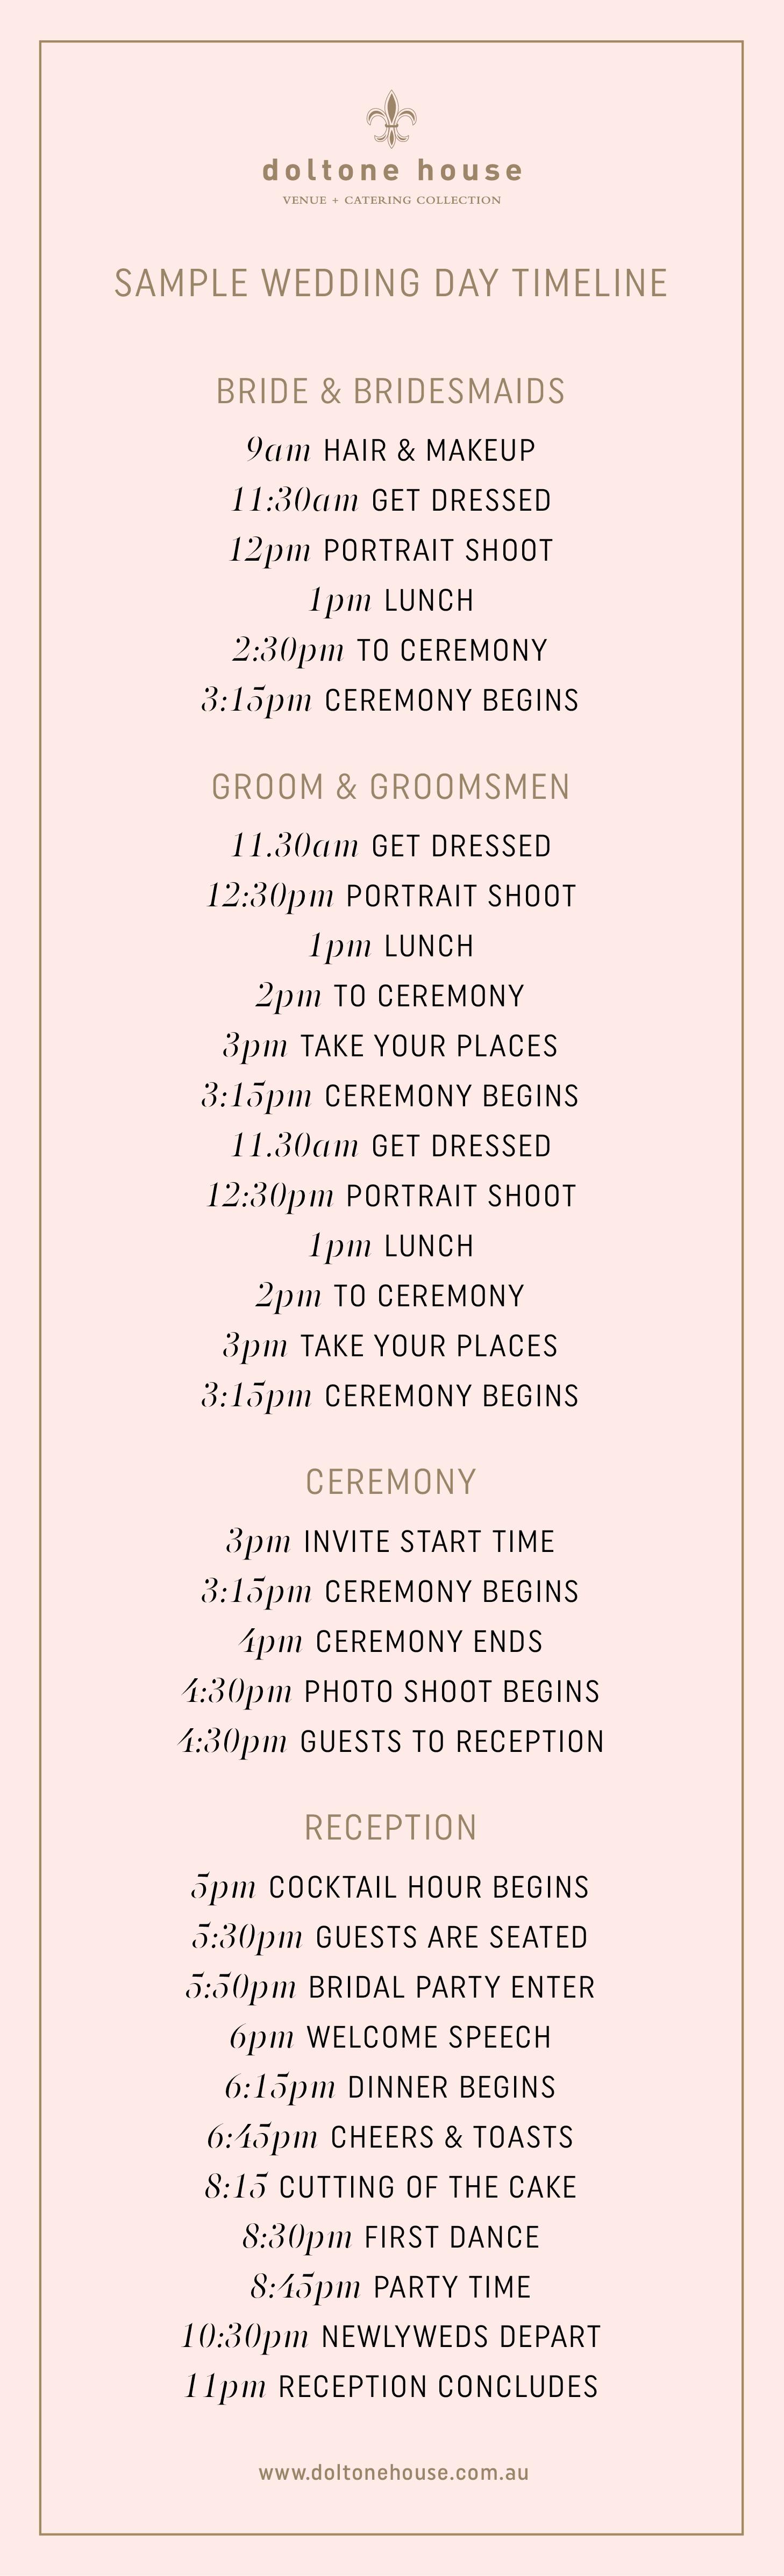 Wedding Ceremony Timeline.A Sample Wedding Day Timeline Doltone House Venue Catering